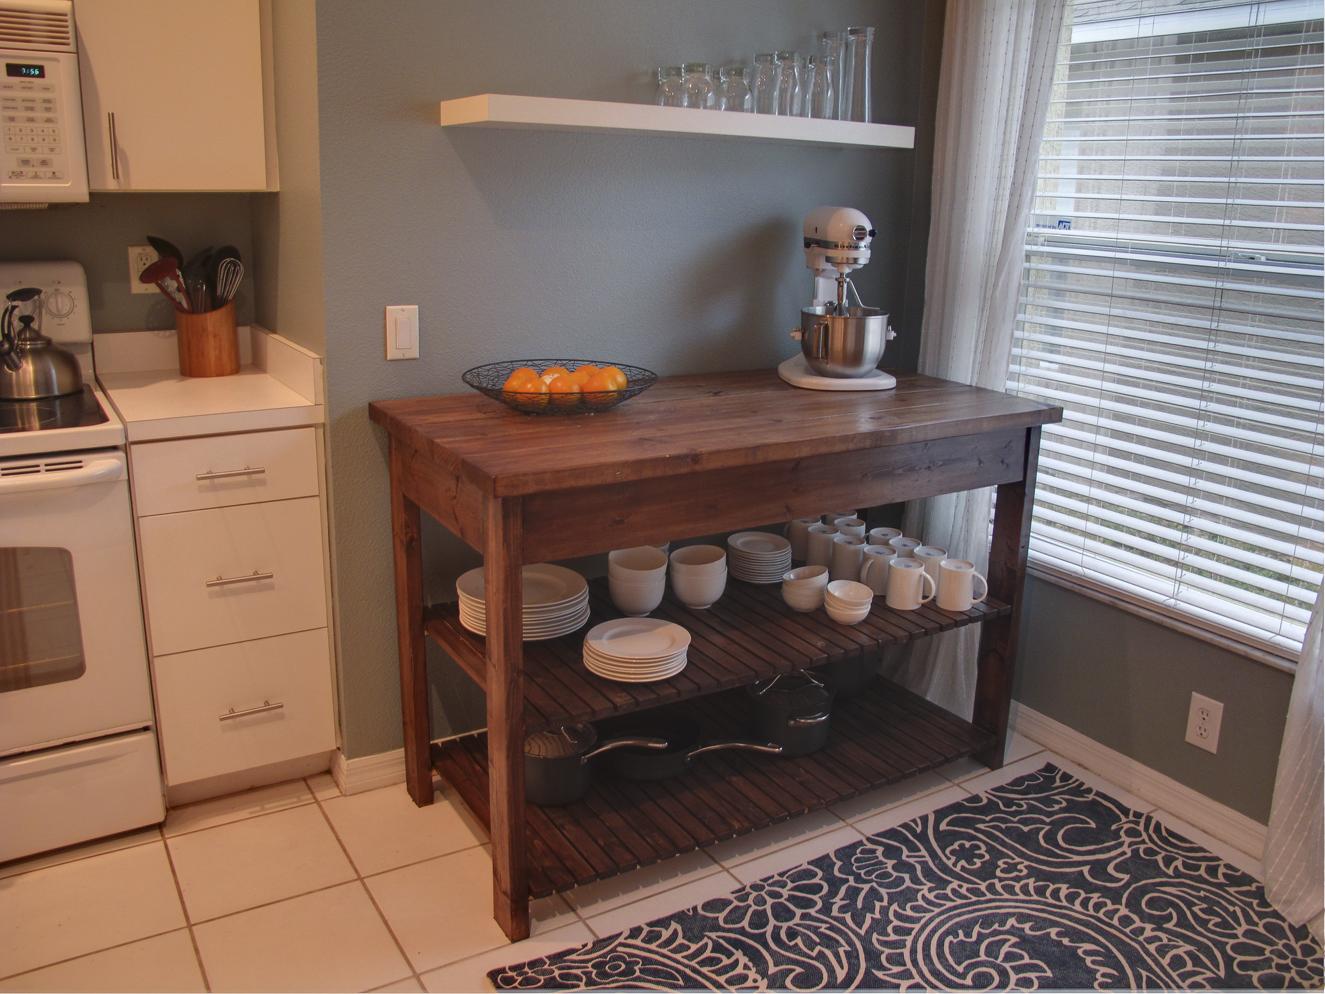 Building A Kitchen Island: Domestic Jenny: Diy Kitchen Island Plans